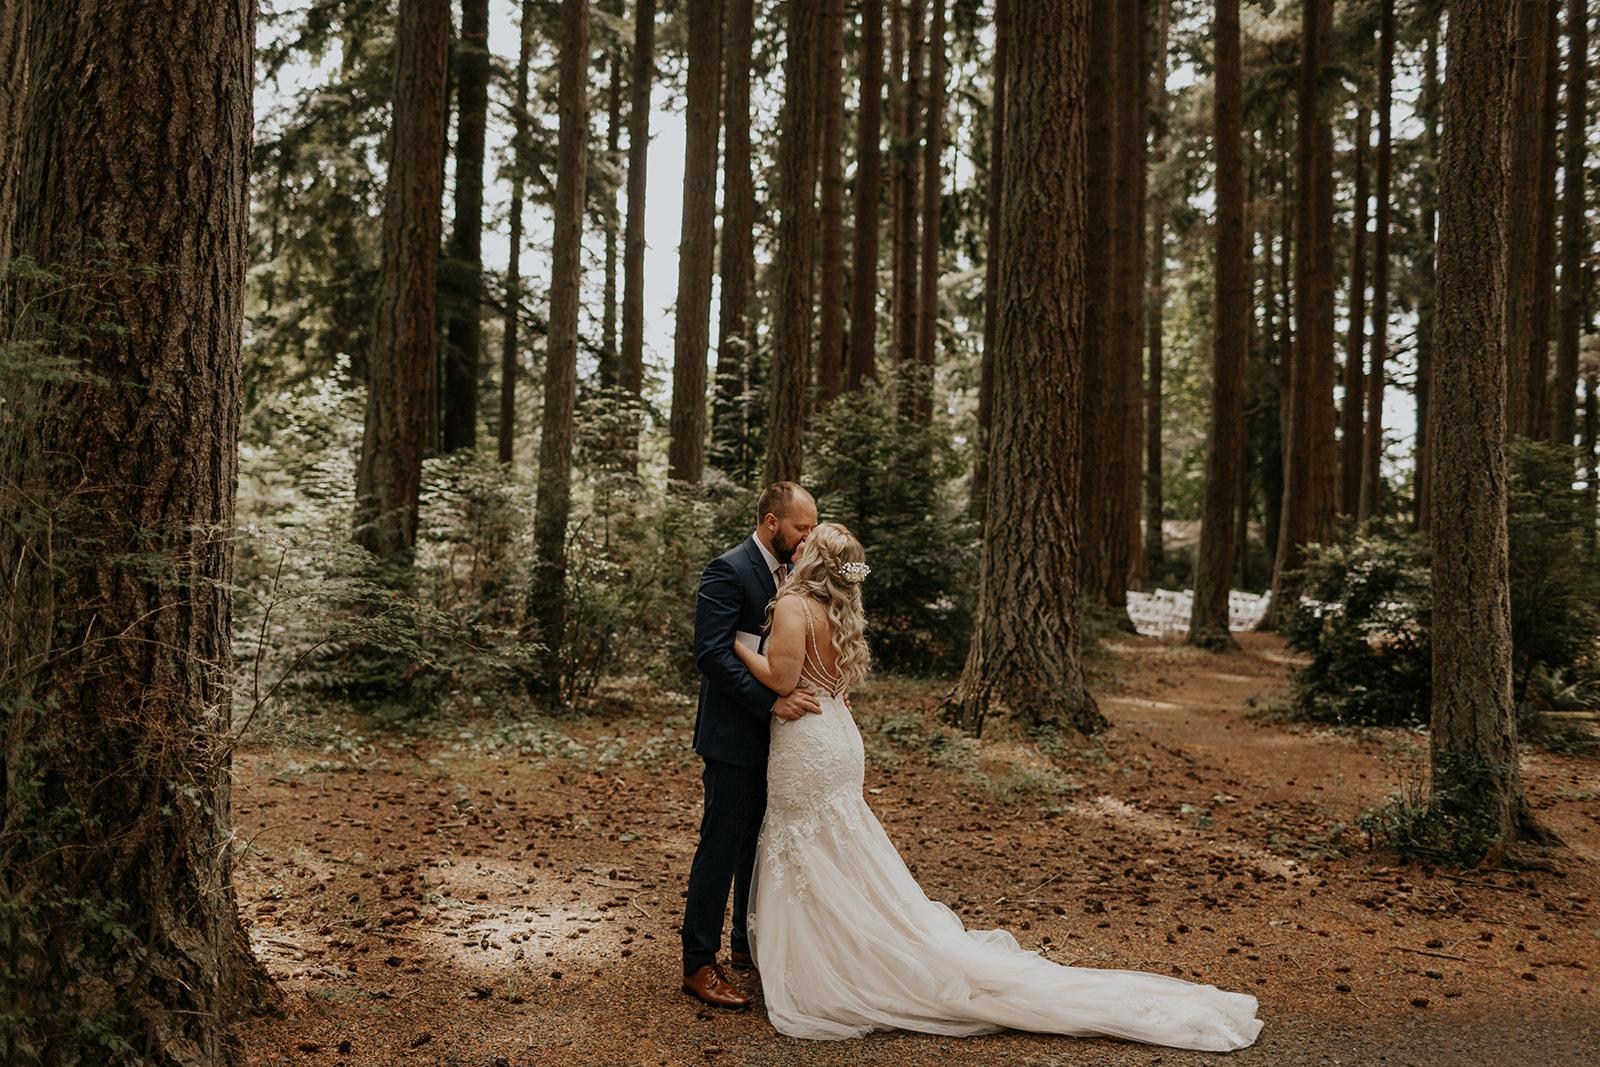 ginapaulson_shannonandbrandonwedding-169.jpg